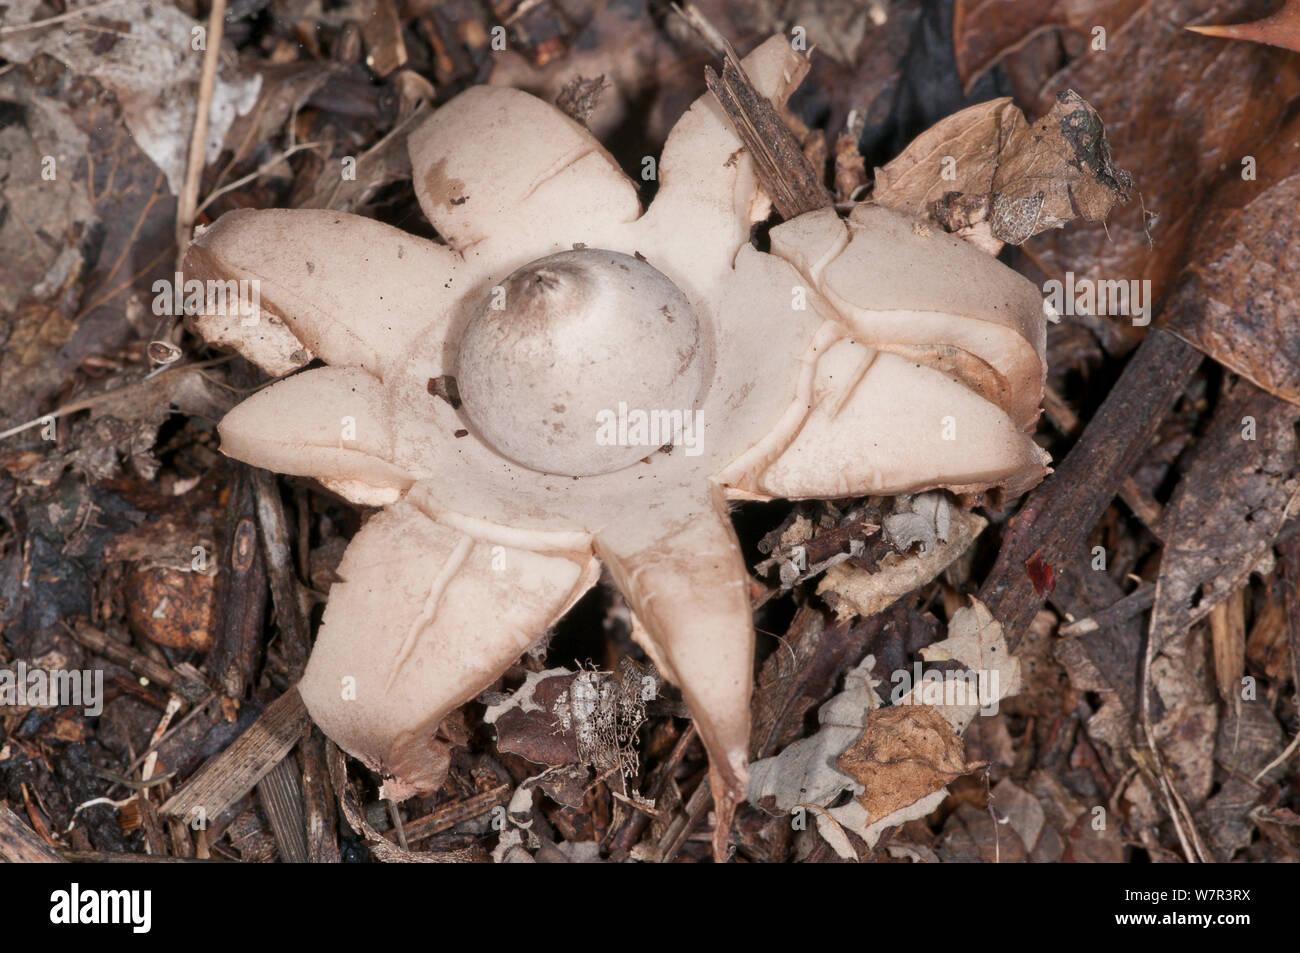 Geastraceae Stock Photos & Geastraceae Stock Images - Alamy